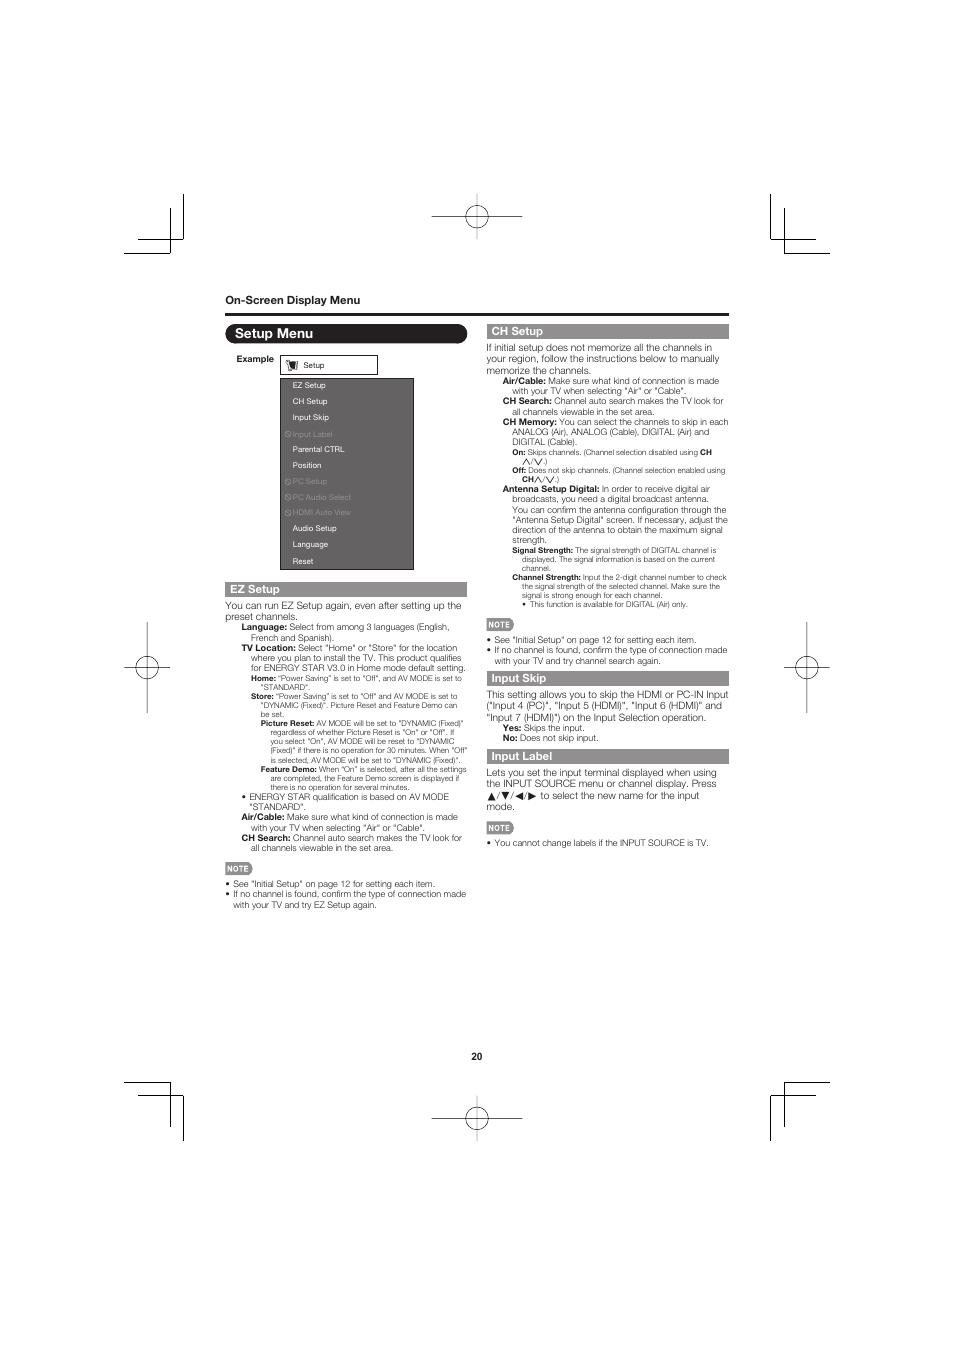 Setup menu, Ez setup, Ch setup | Sharp AQUOS LC-32D47UN User Manual